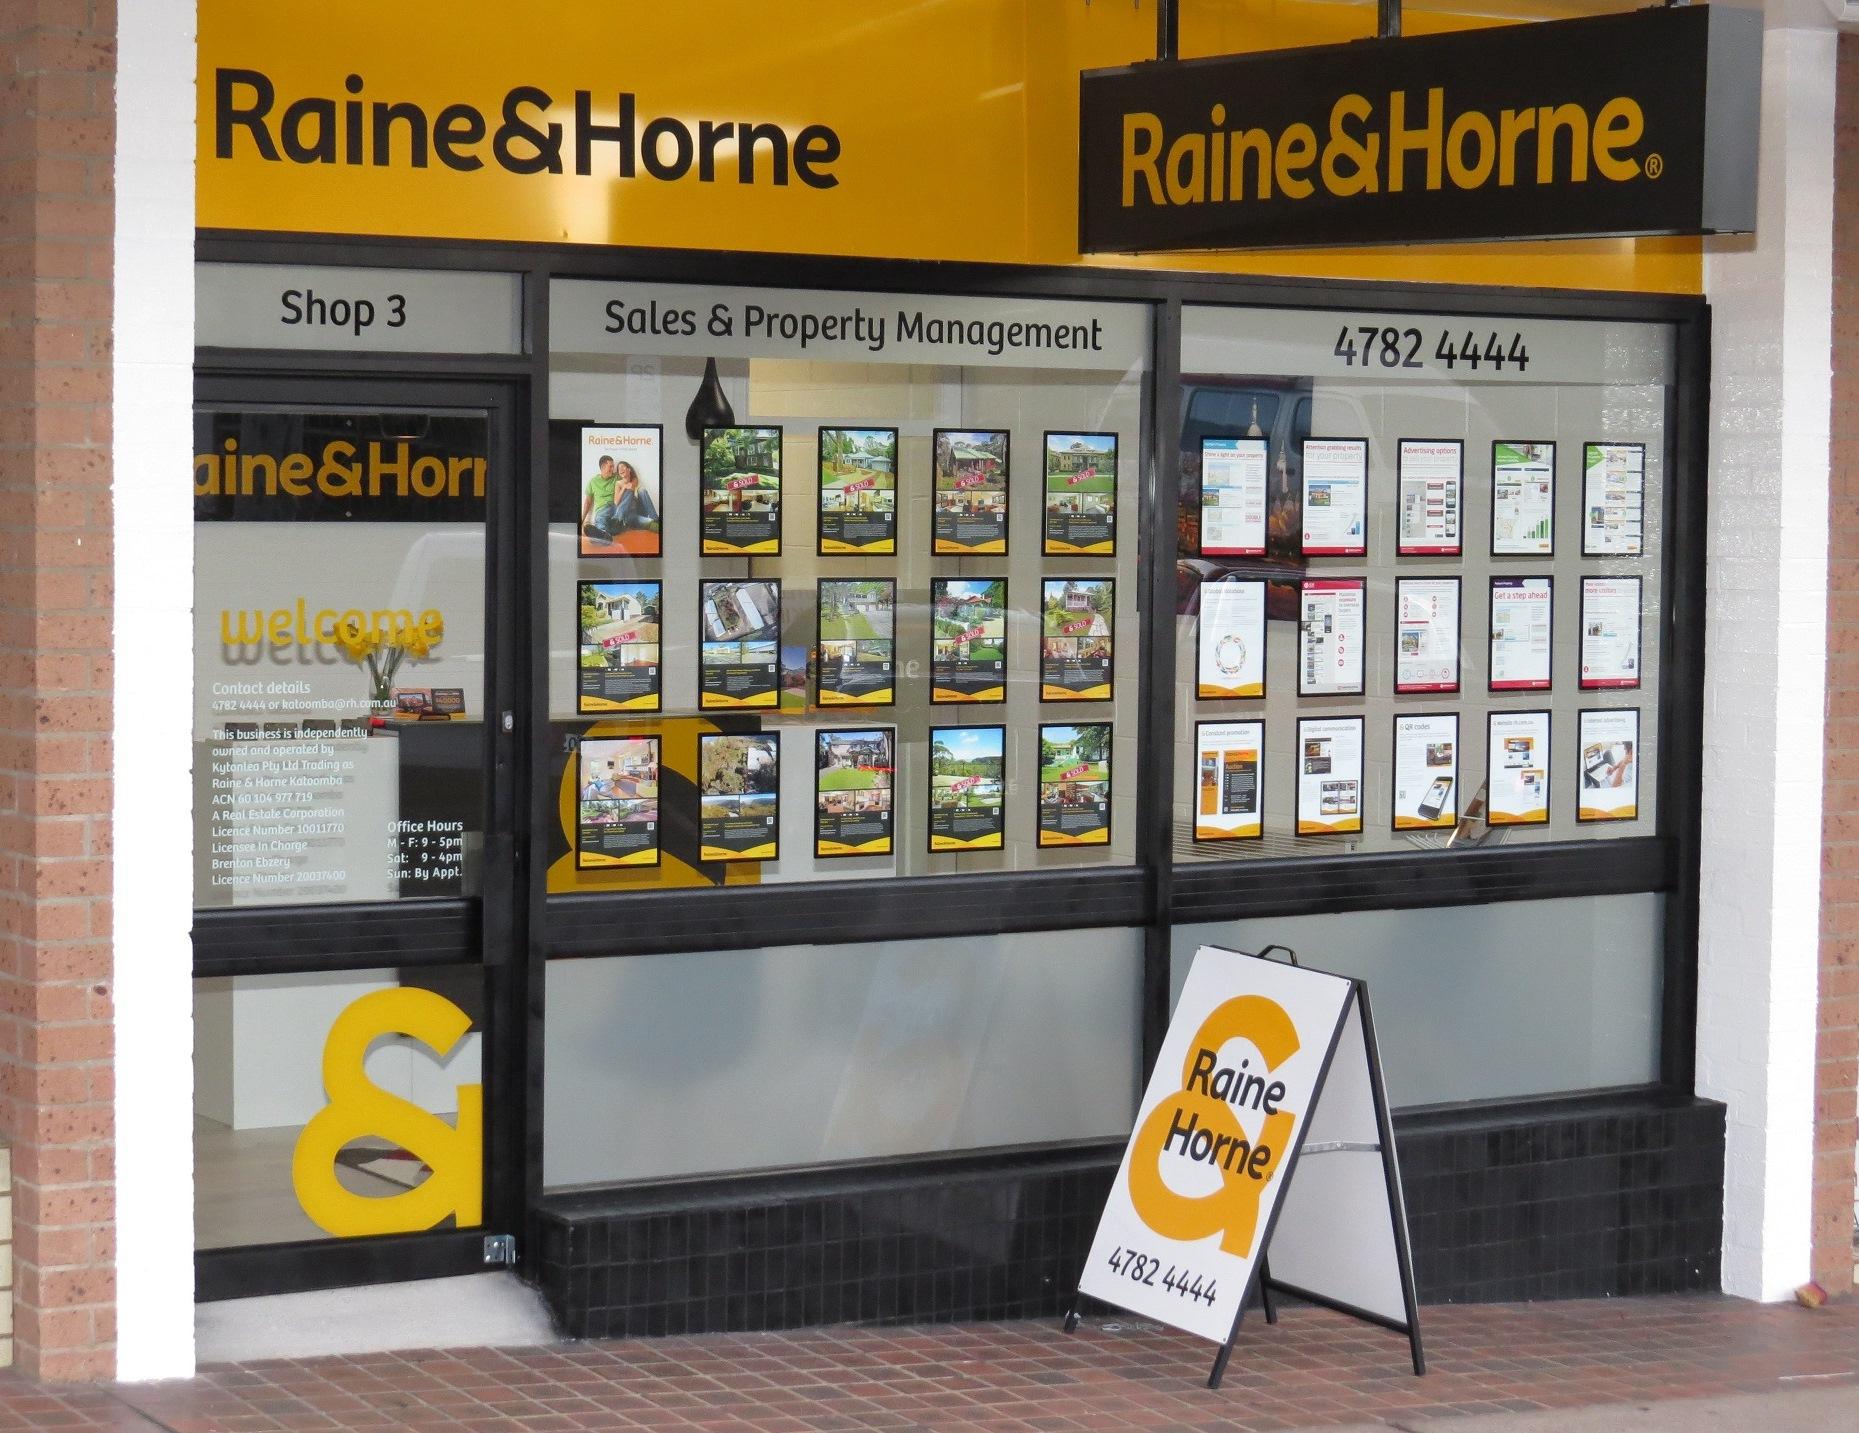 Raine & Horne Katoomba